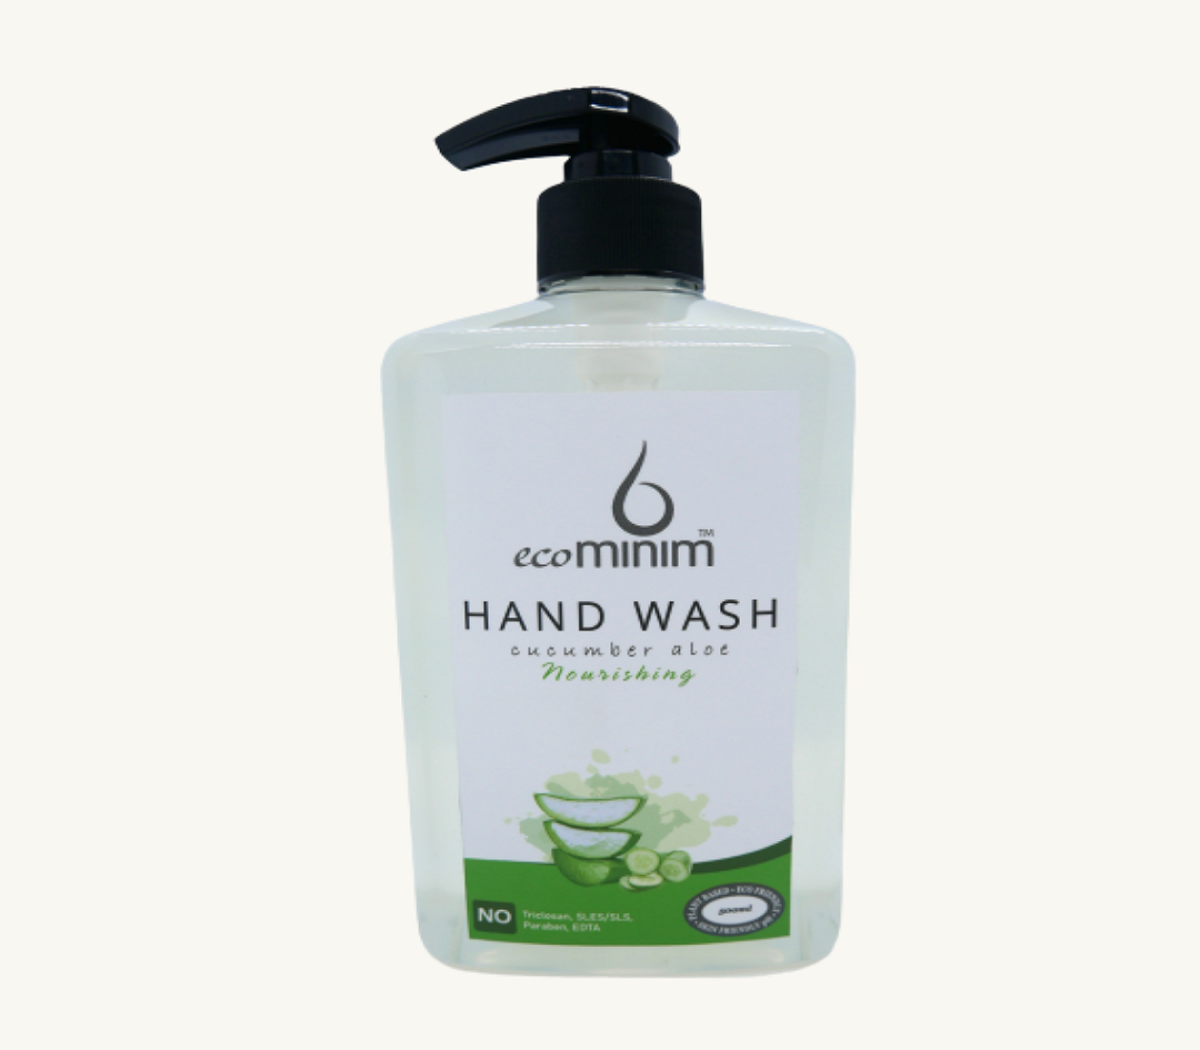 Hand Wash Liquid - Cucumber Aloe